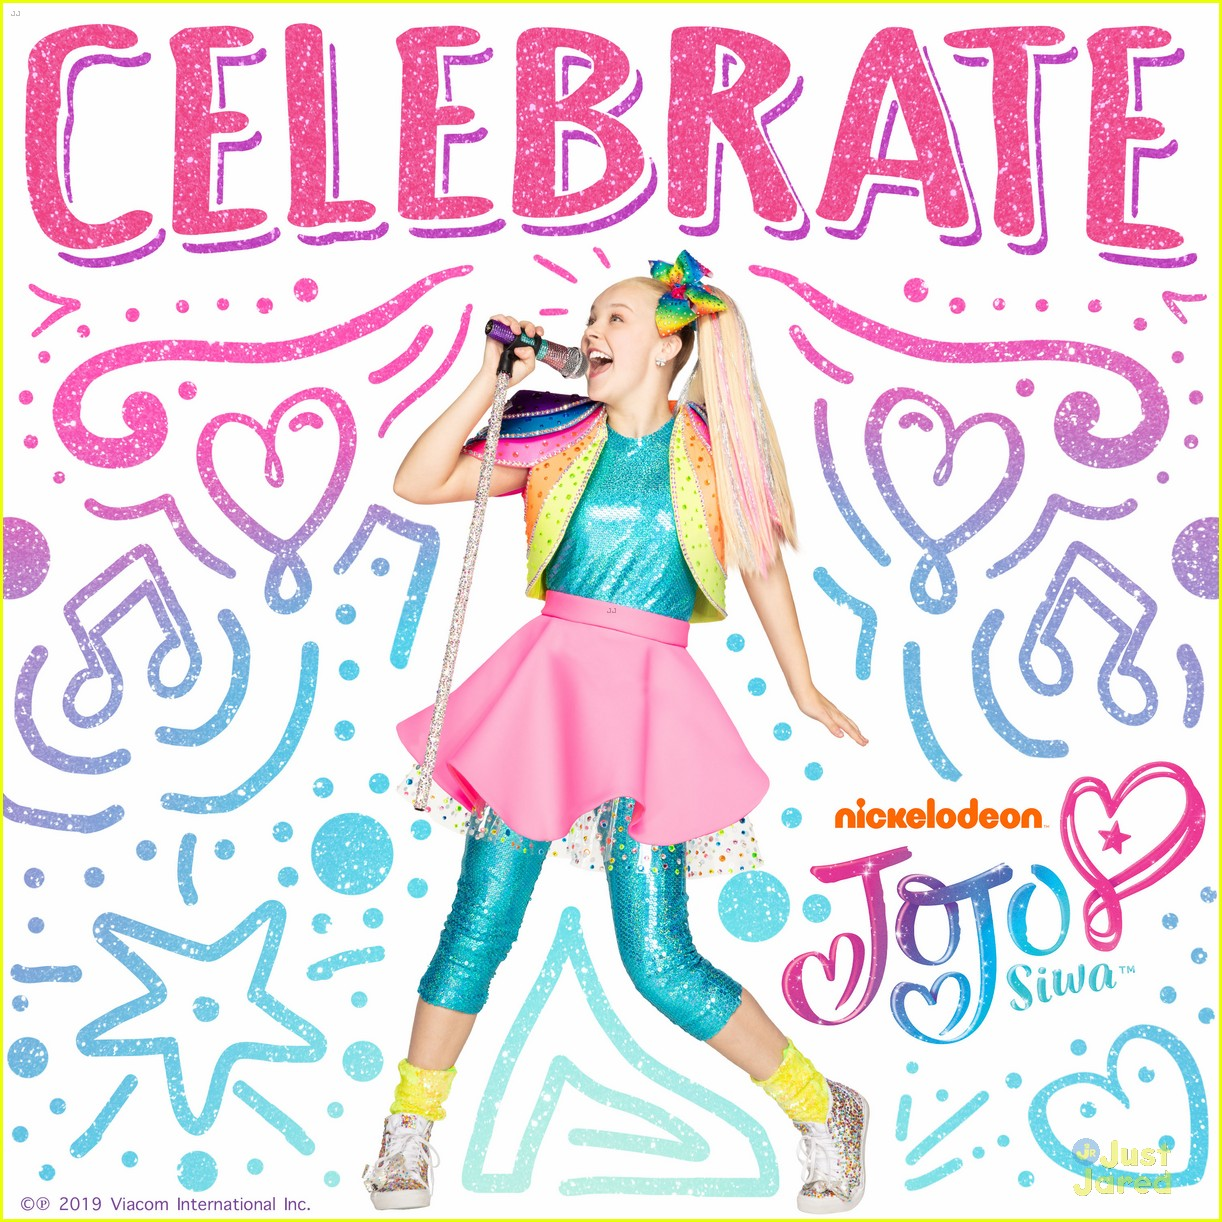 jojo celebrate ep drops video pics 02